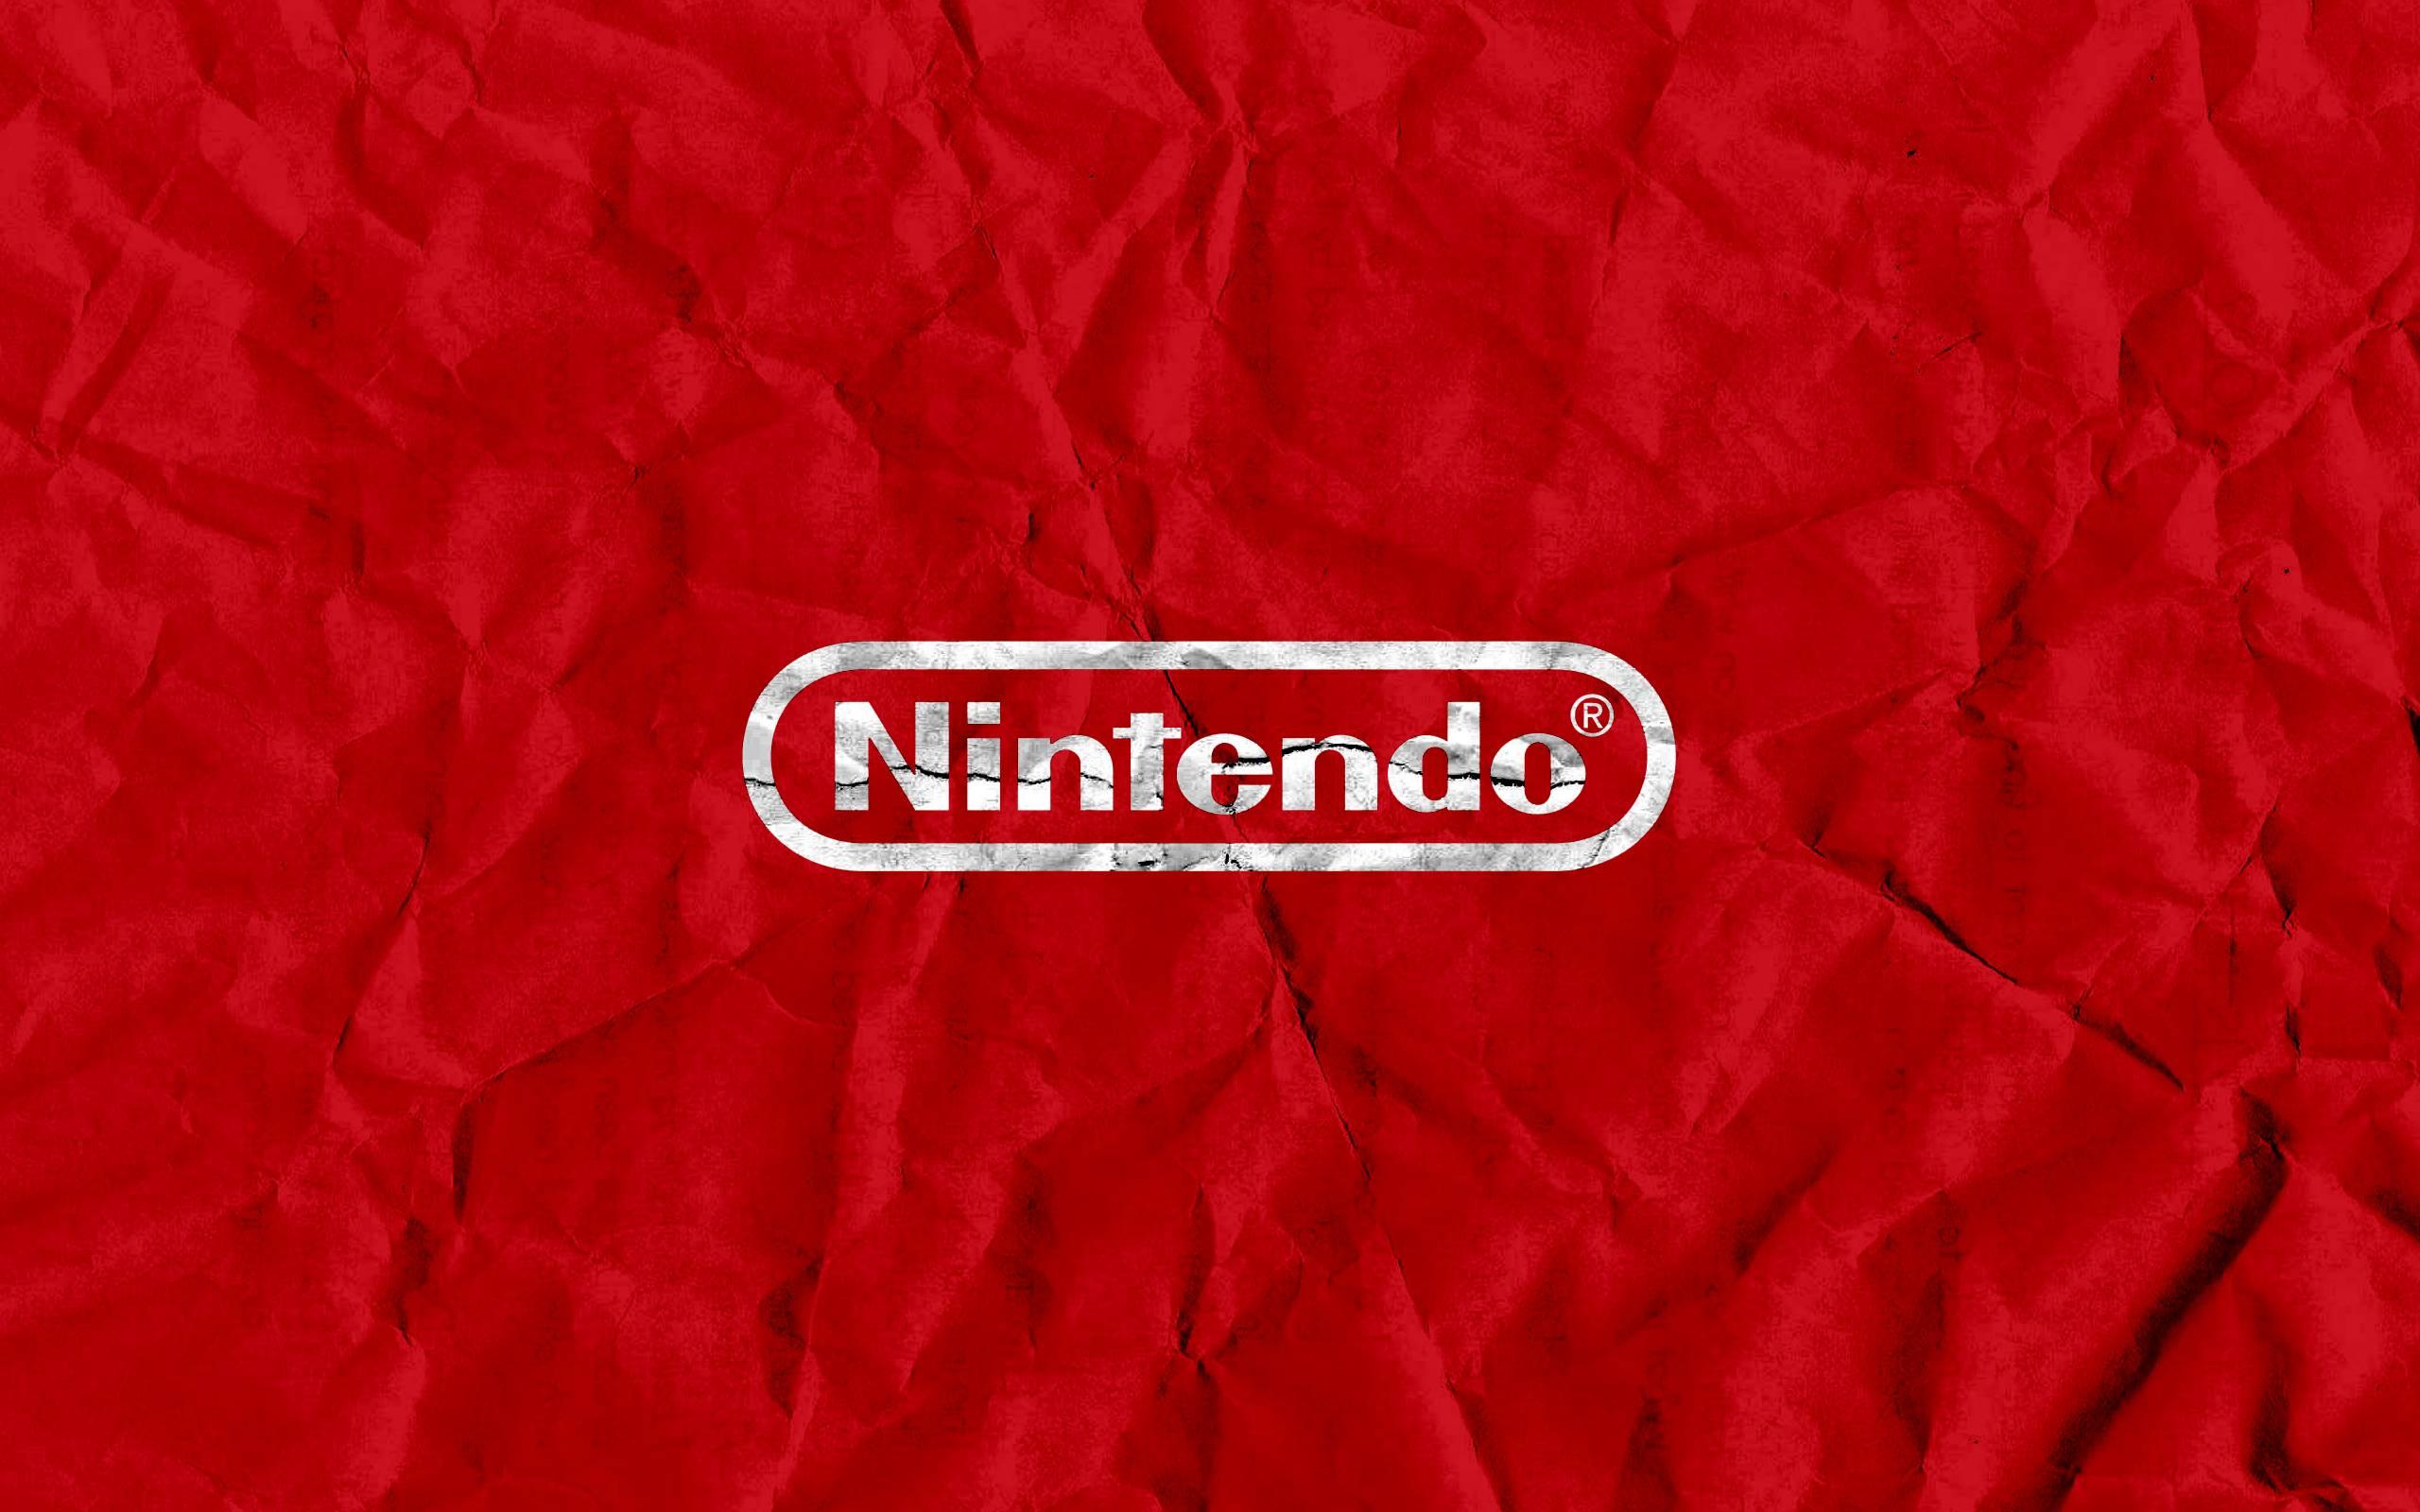 Nintendo switch wallpapers wallpaper cave - Nes wallpaper ...